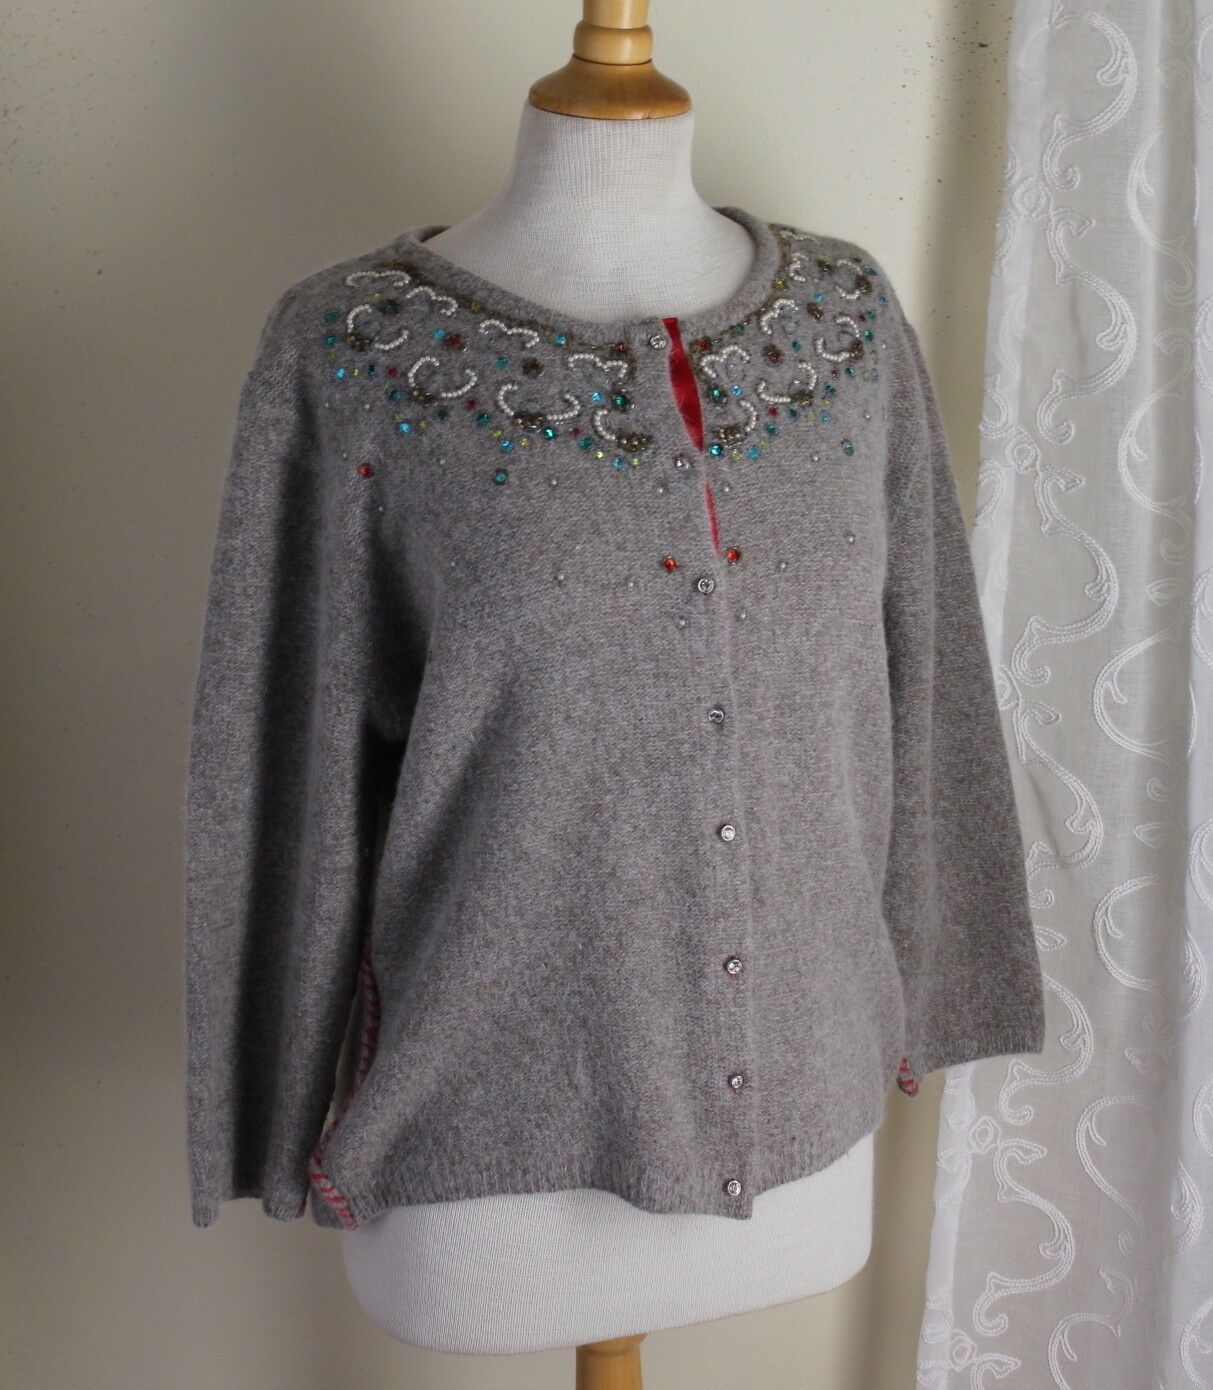 Soft Surroundings -Sz L Vintage Inspirot Funky Fun Beaded Cardigan Sweater